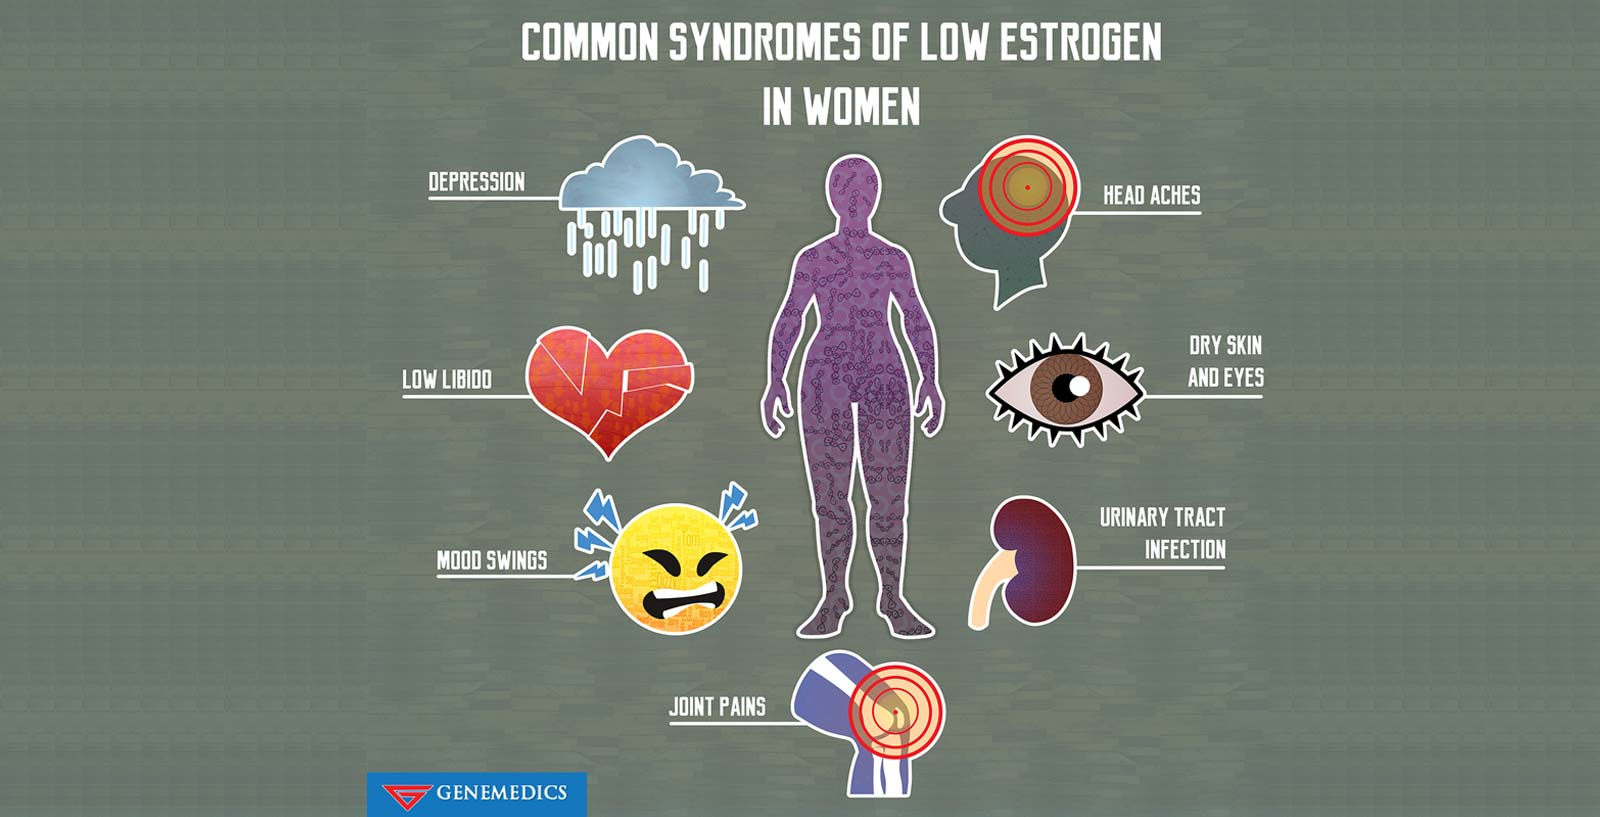 Common Syndromes Of Low Estrogen In Women